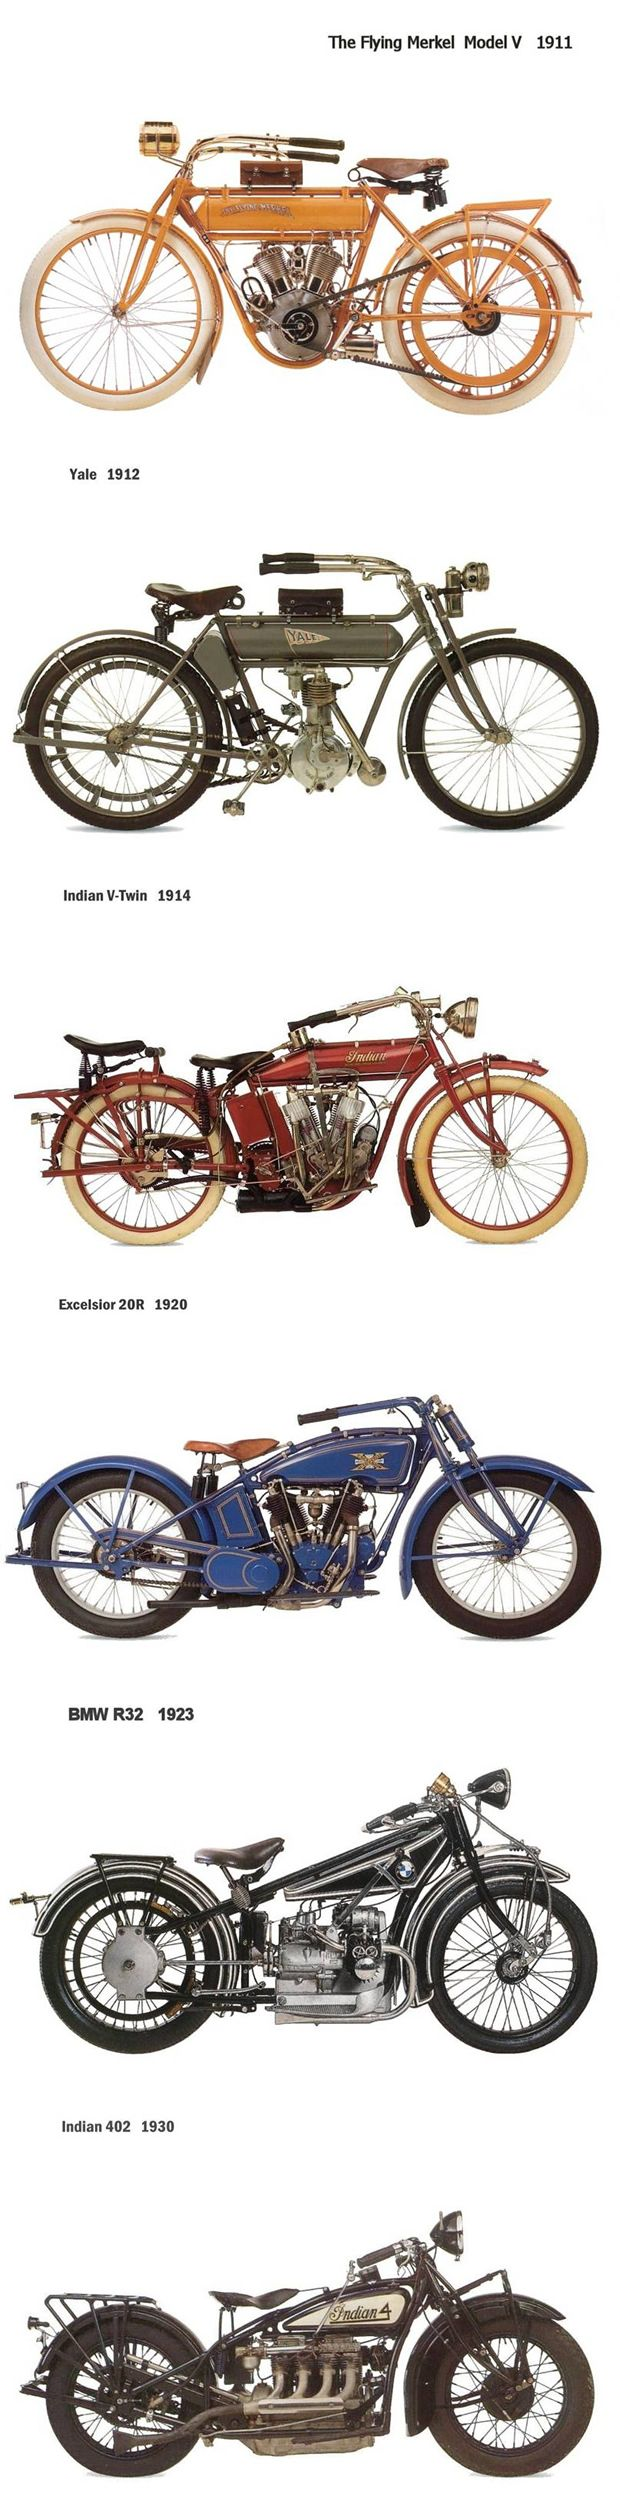 Retro Motocycles